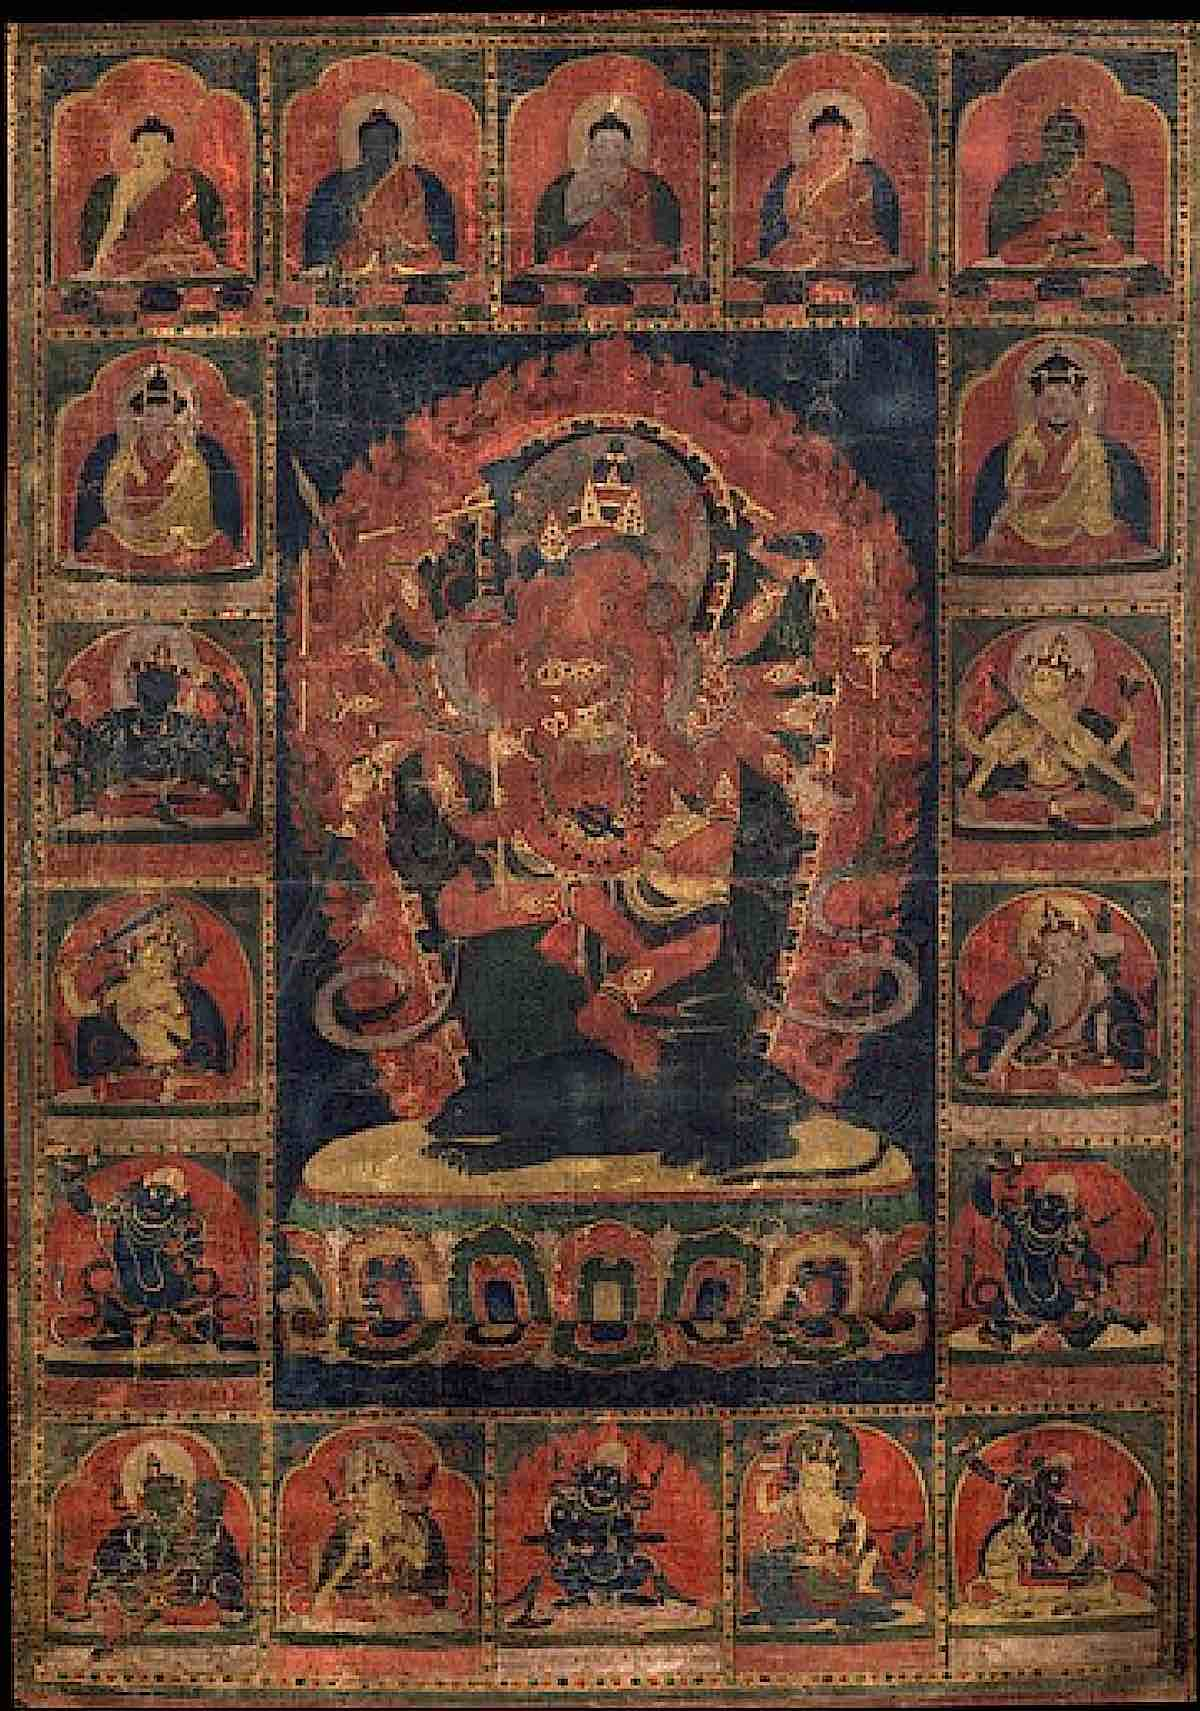 Buddha Weekly 12 armed Maha Rakta Ganapati in the Rubin Museum collection Buddhism